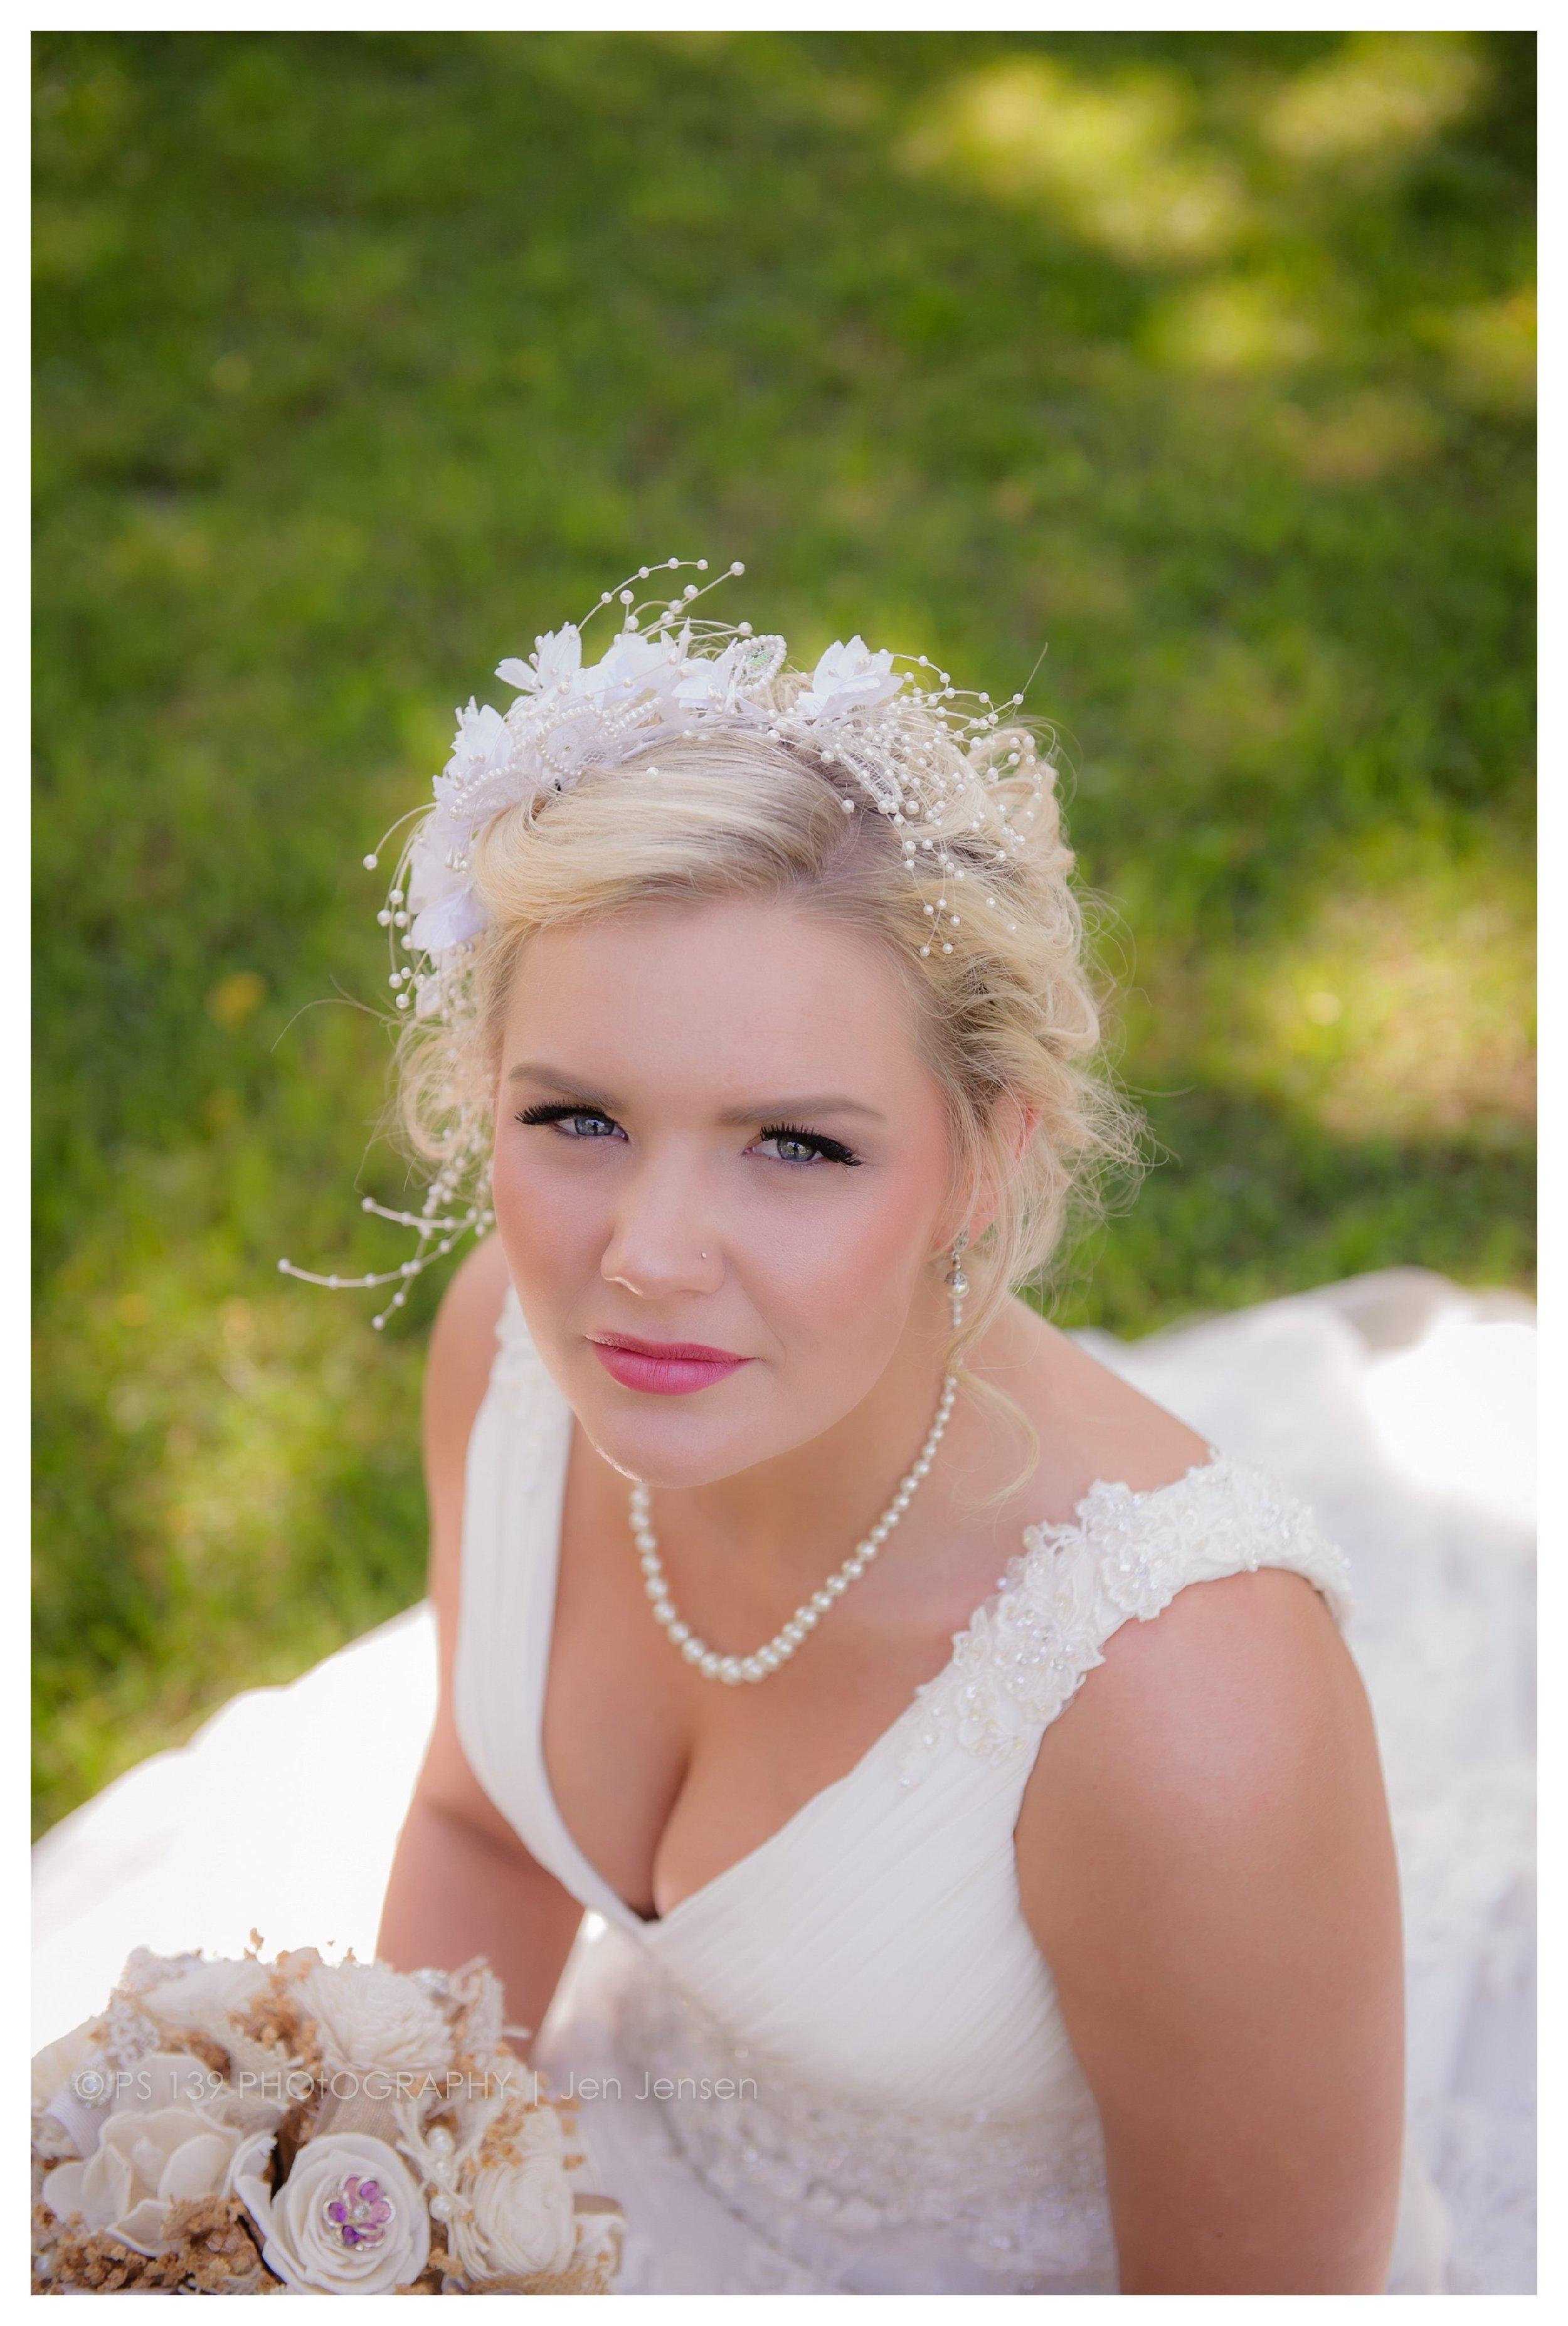 oregon Illinois oak lane farm wisconsin wedding photographer bayfield wi ps 139 photography jen jensen_0235.jpg